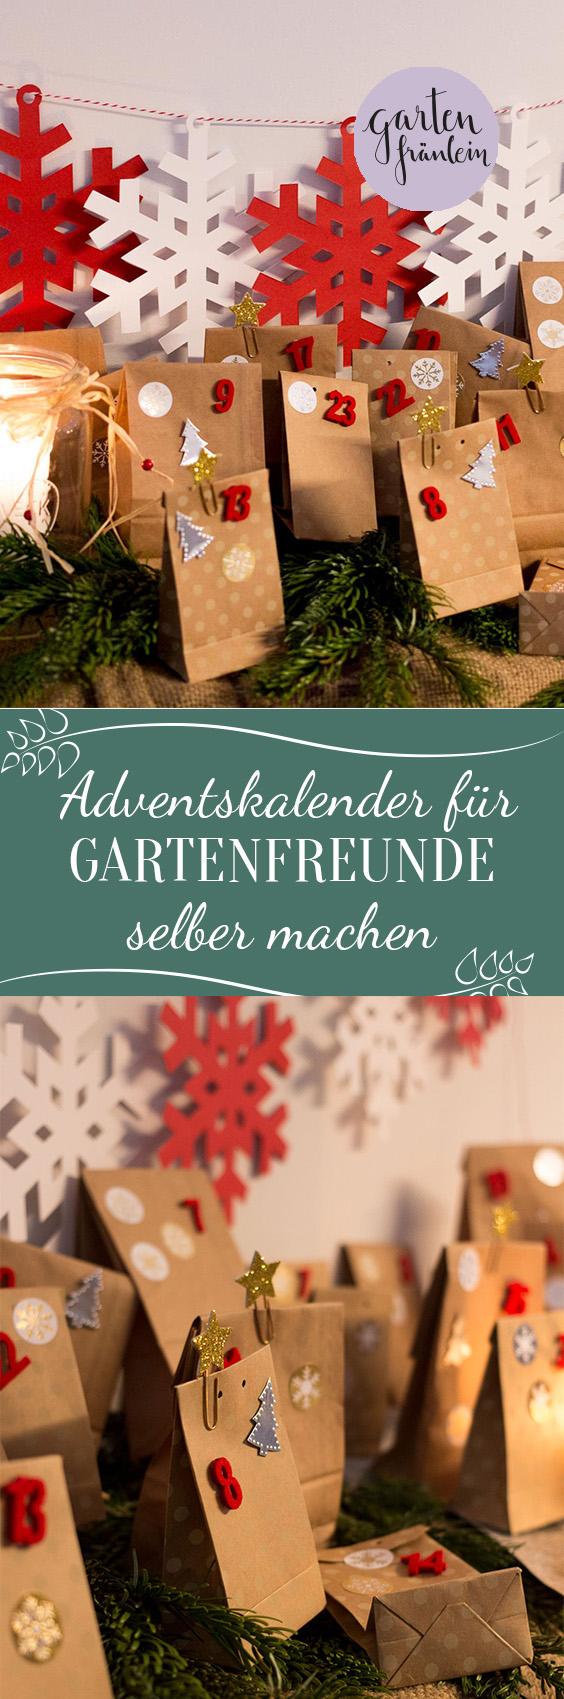 Adventskalender-Gartenfreunde